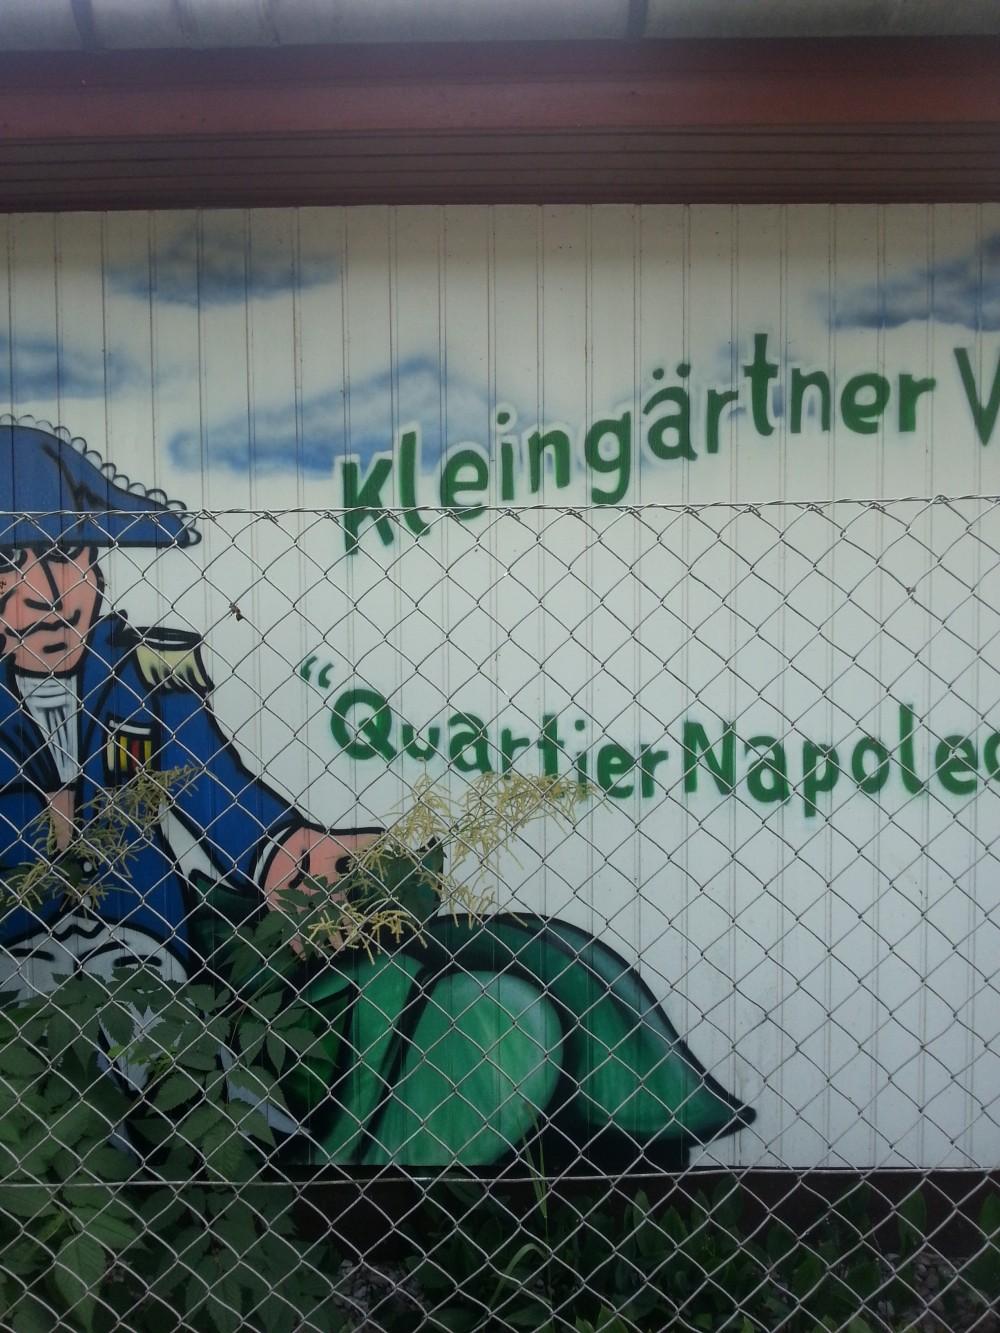 Kleingärtnerverein Quartier Napoleon